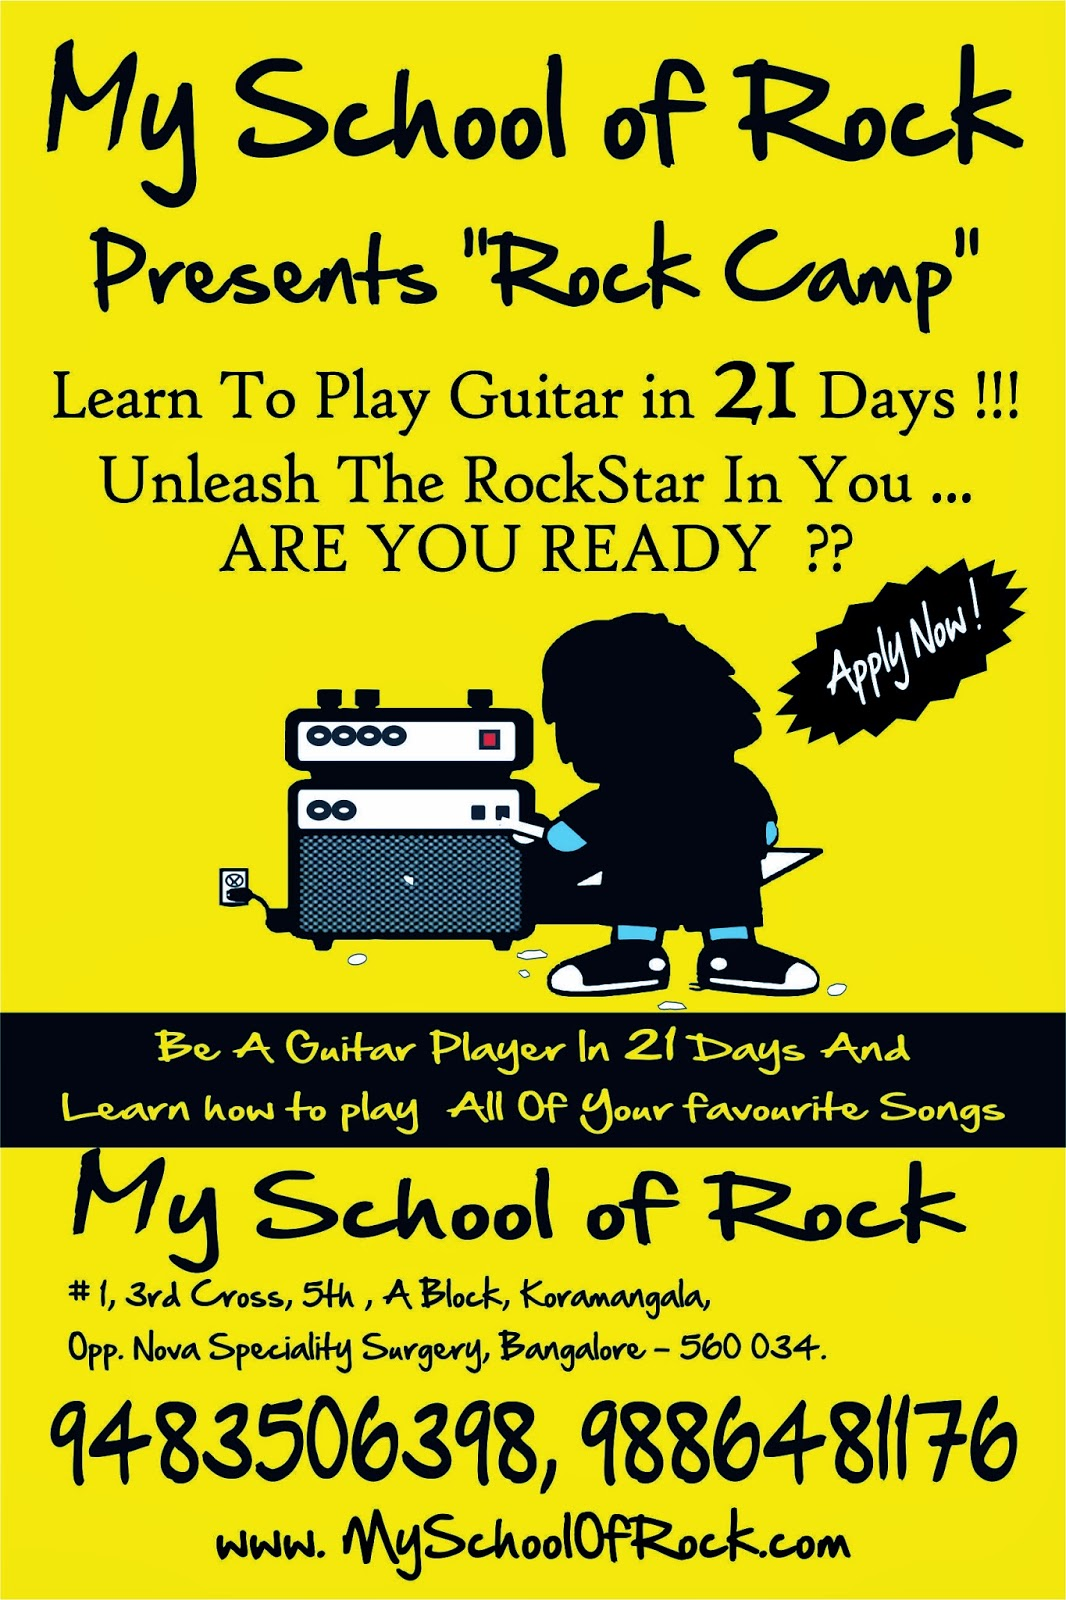 rock camp 2014 guitar classes near me koramangala bangalore. Black Bedroom Furniture Sets. Home Design Ideas